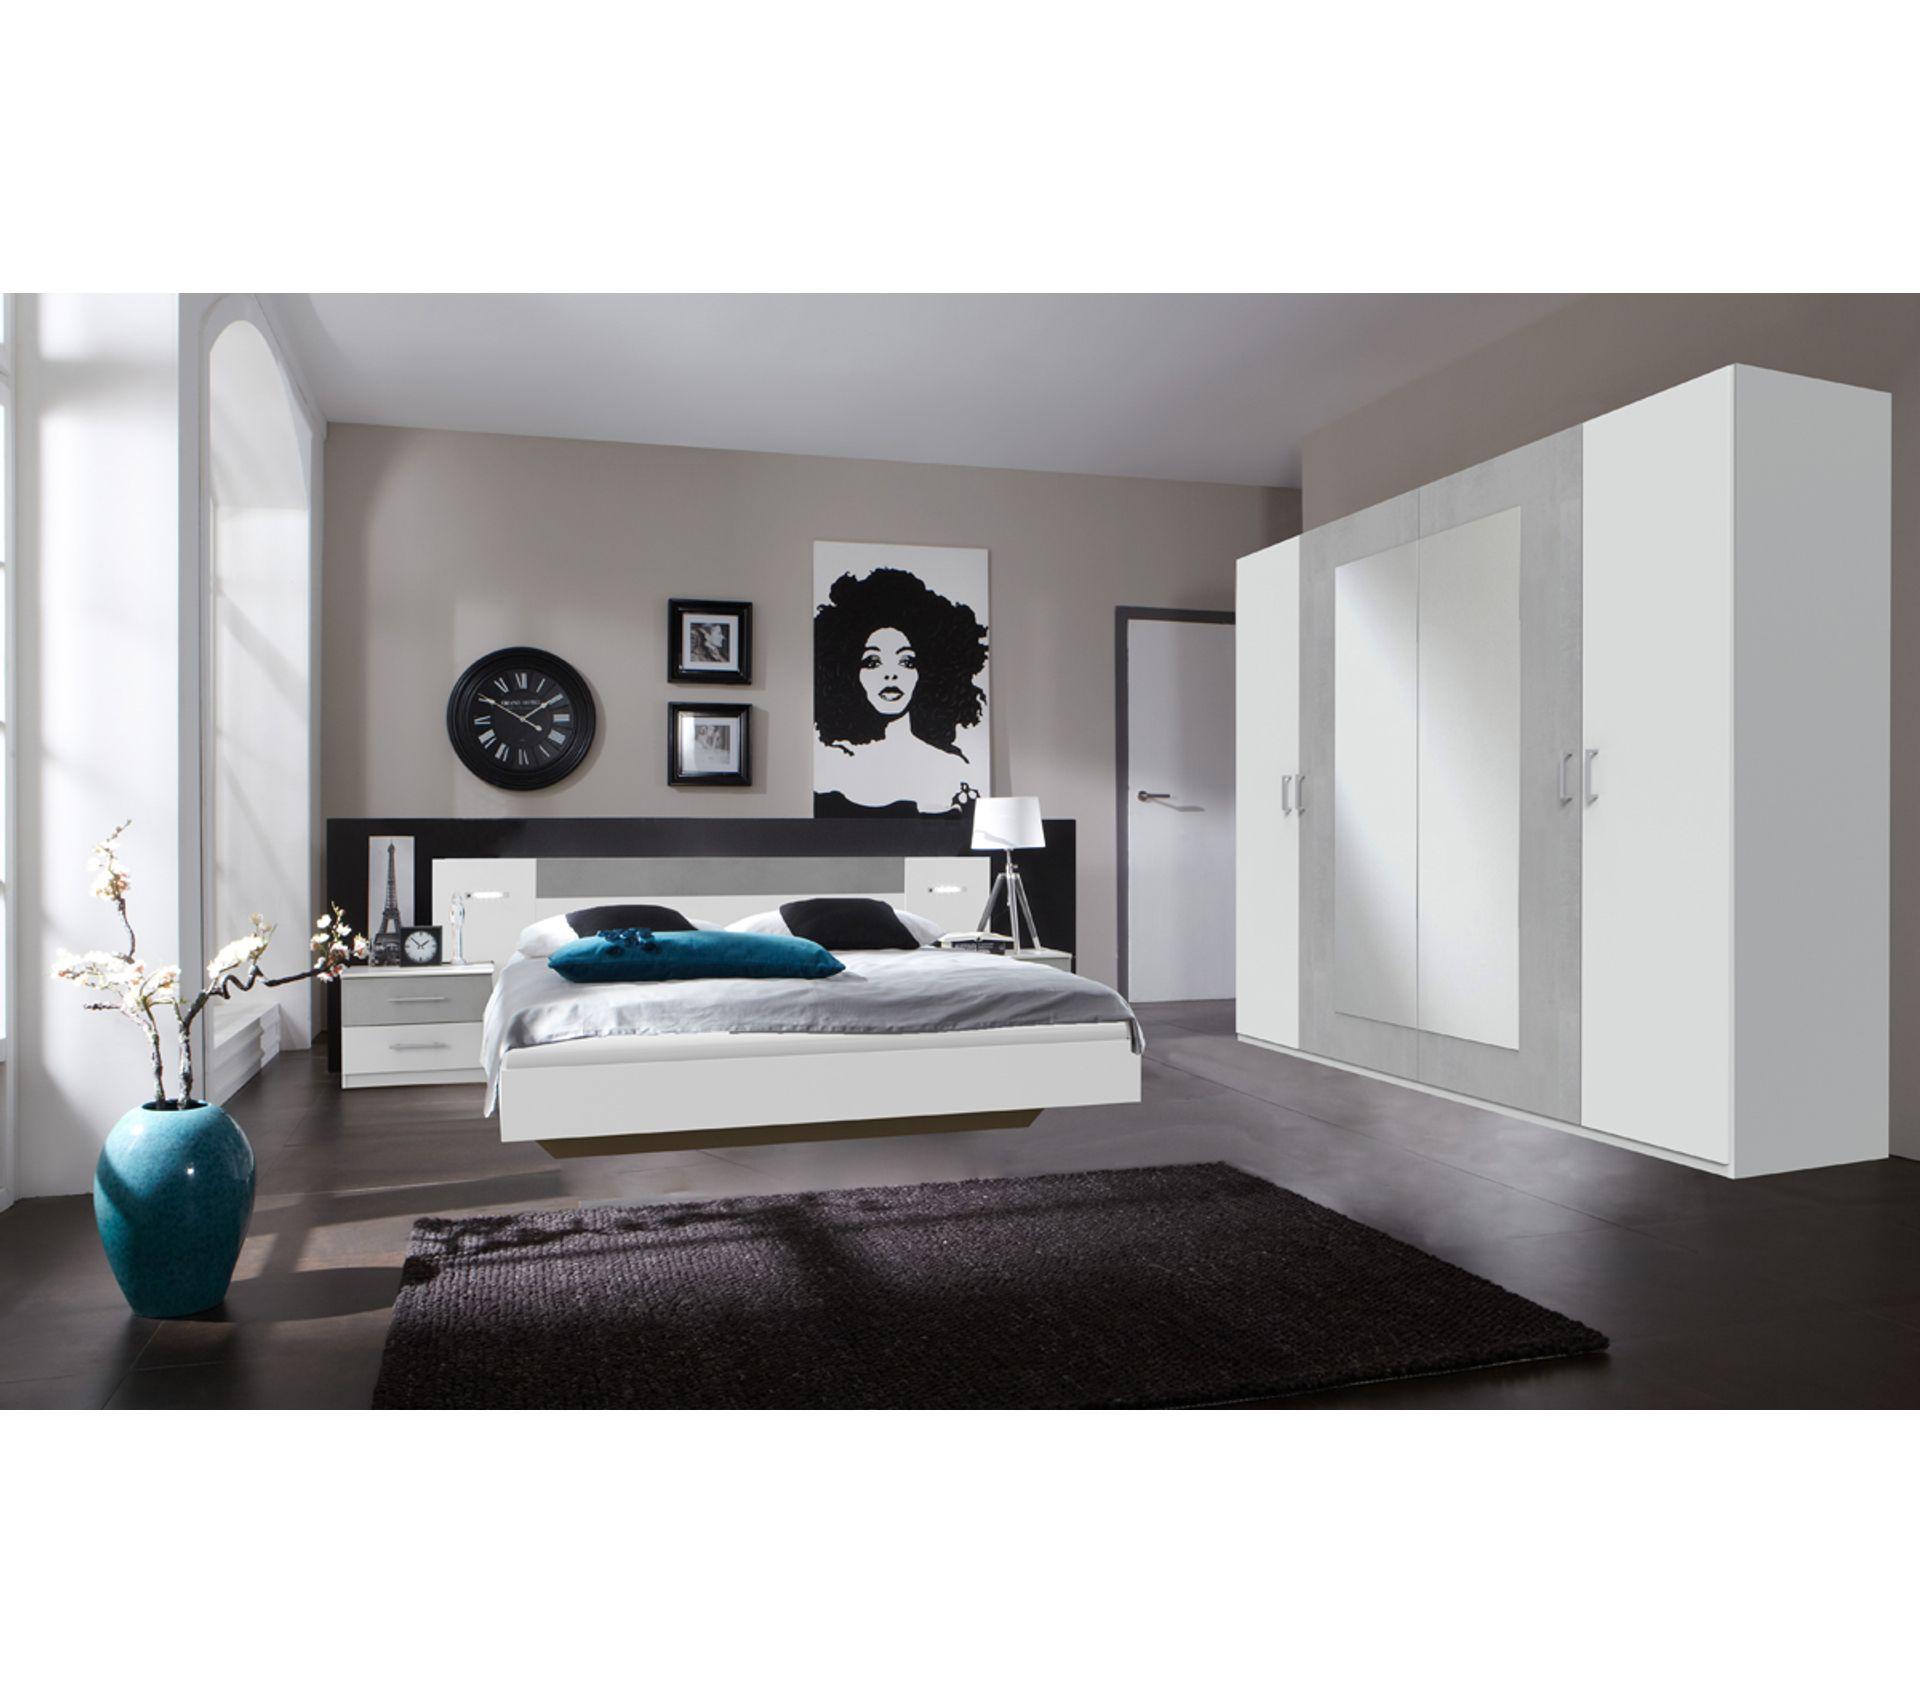 Teinte De Gris Clair ensemble chambre adulte en imitation chêne hickory, rechampis teinte beton  gris clair - 160 x 200 cm